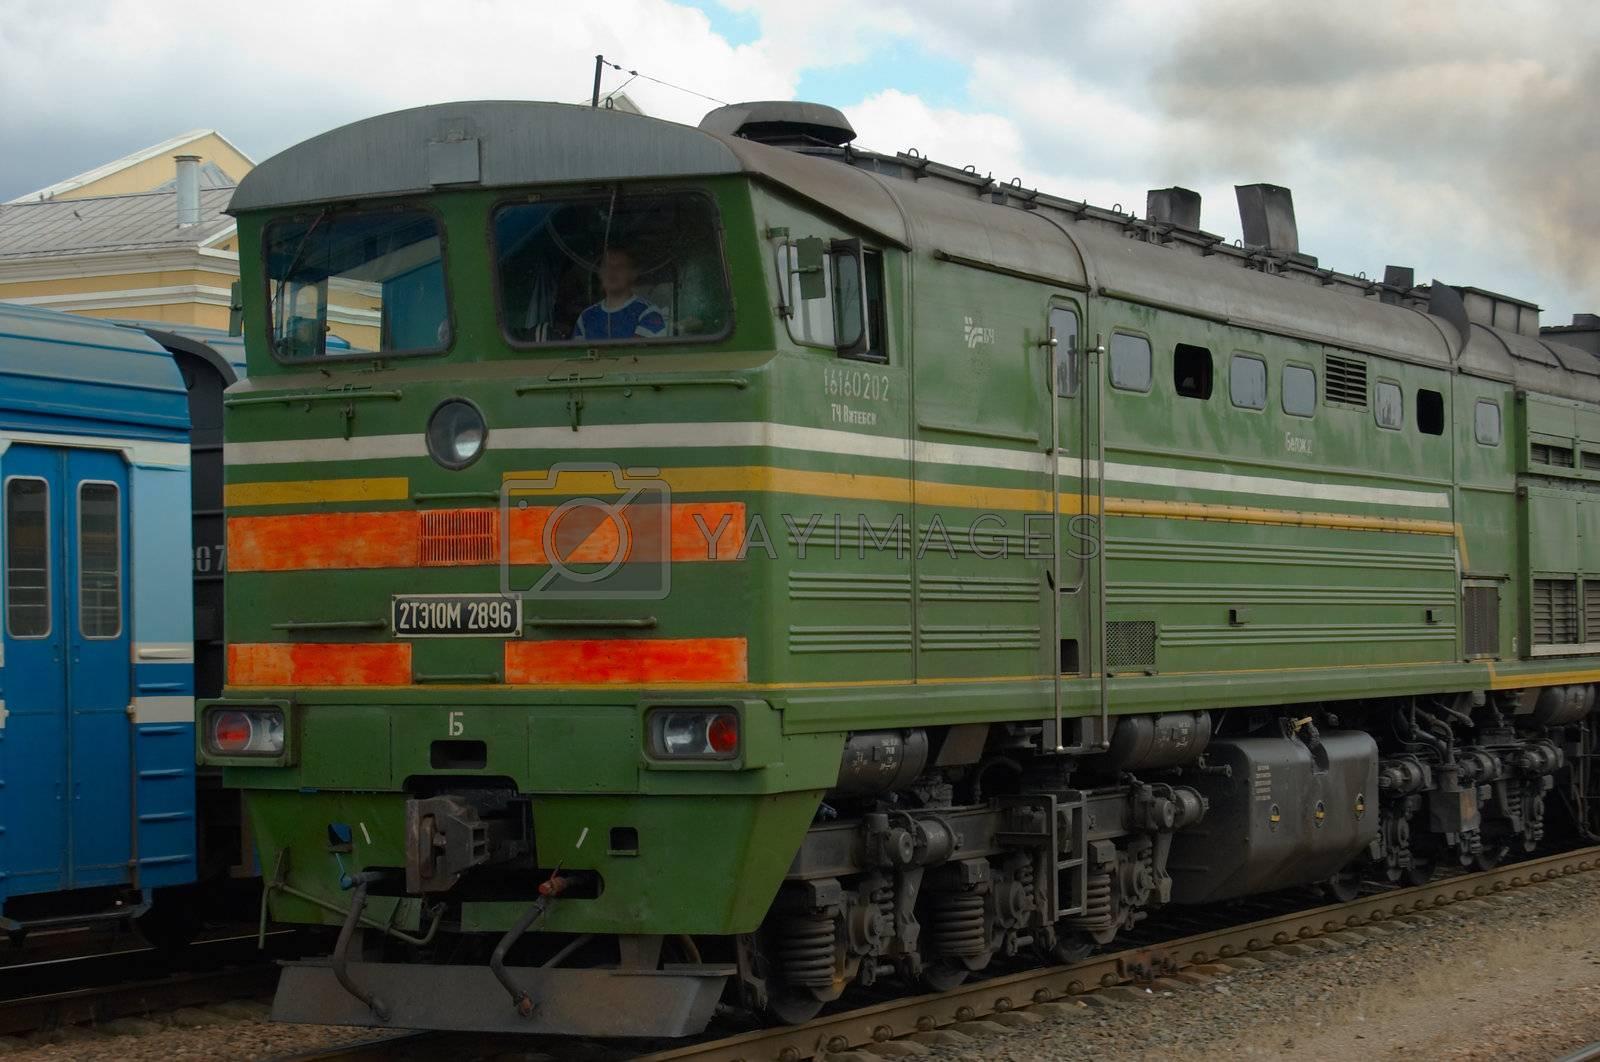 The cargo disel locomotive drives a heavy train